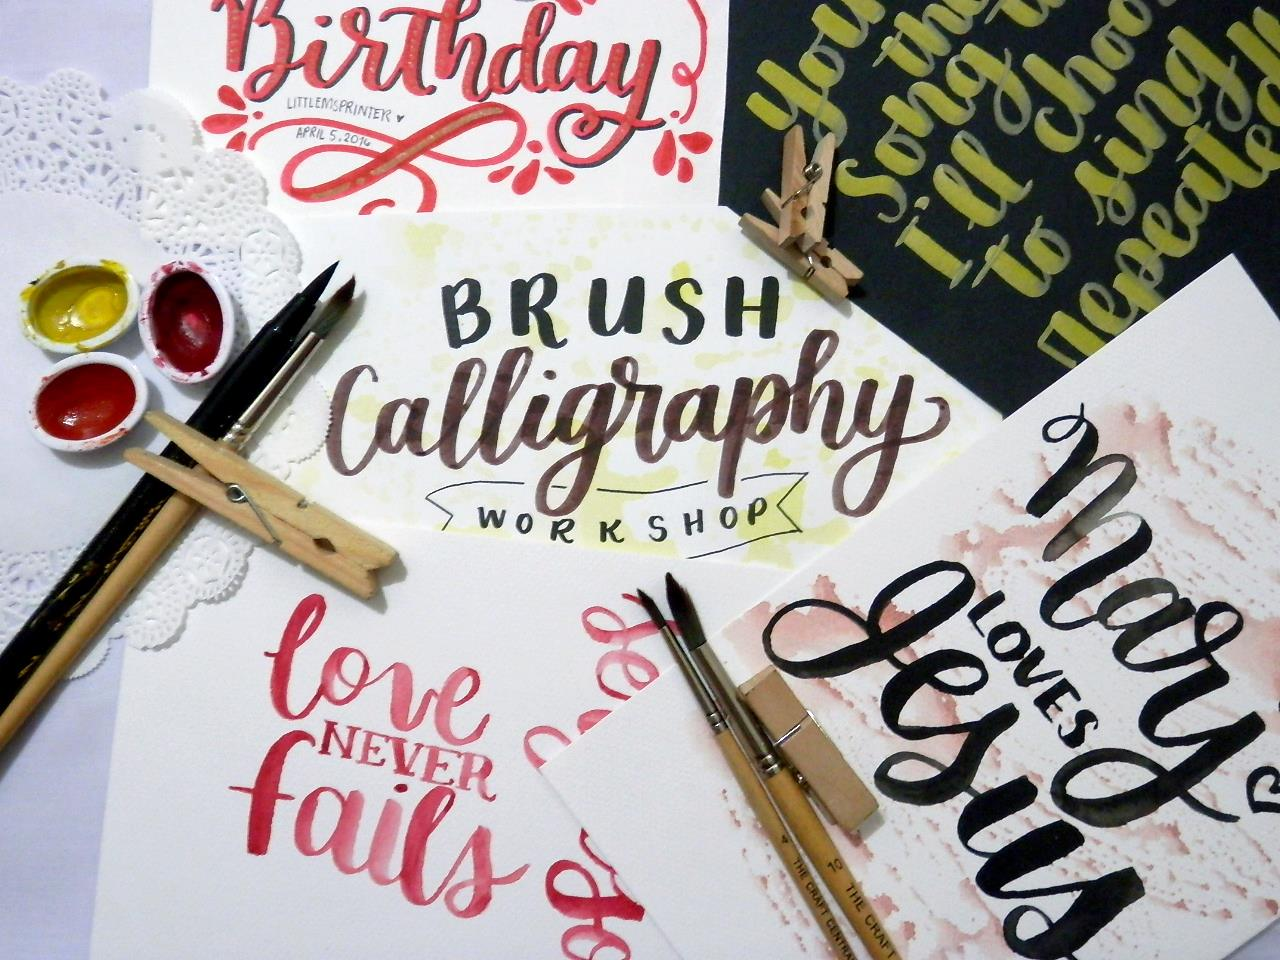 Brush calligraphy with littlemsprinter manila for kids